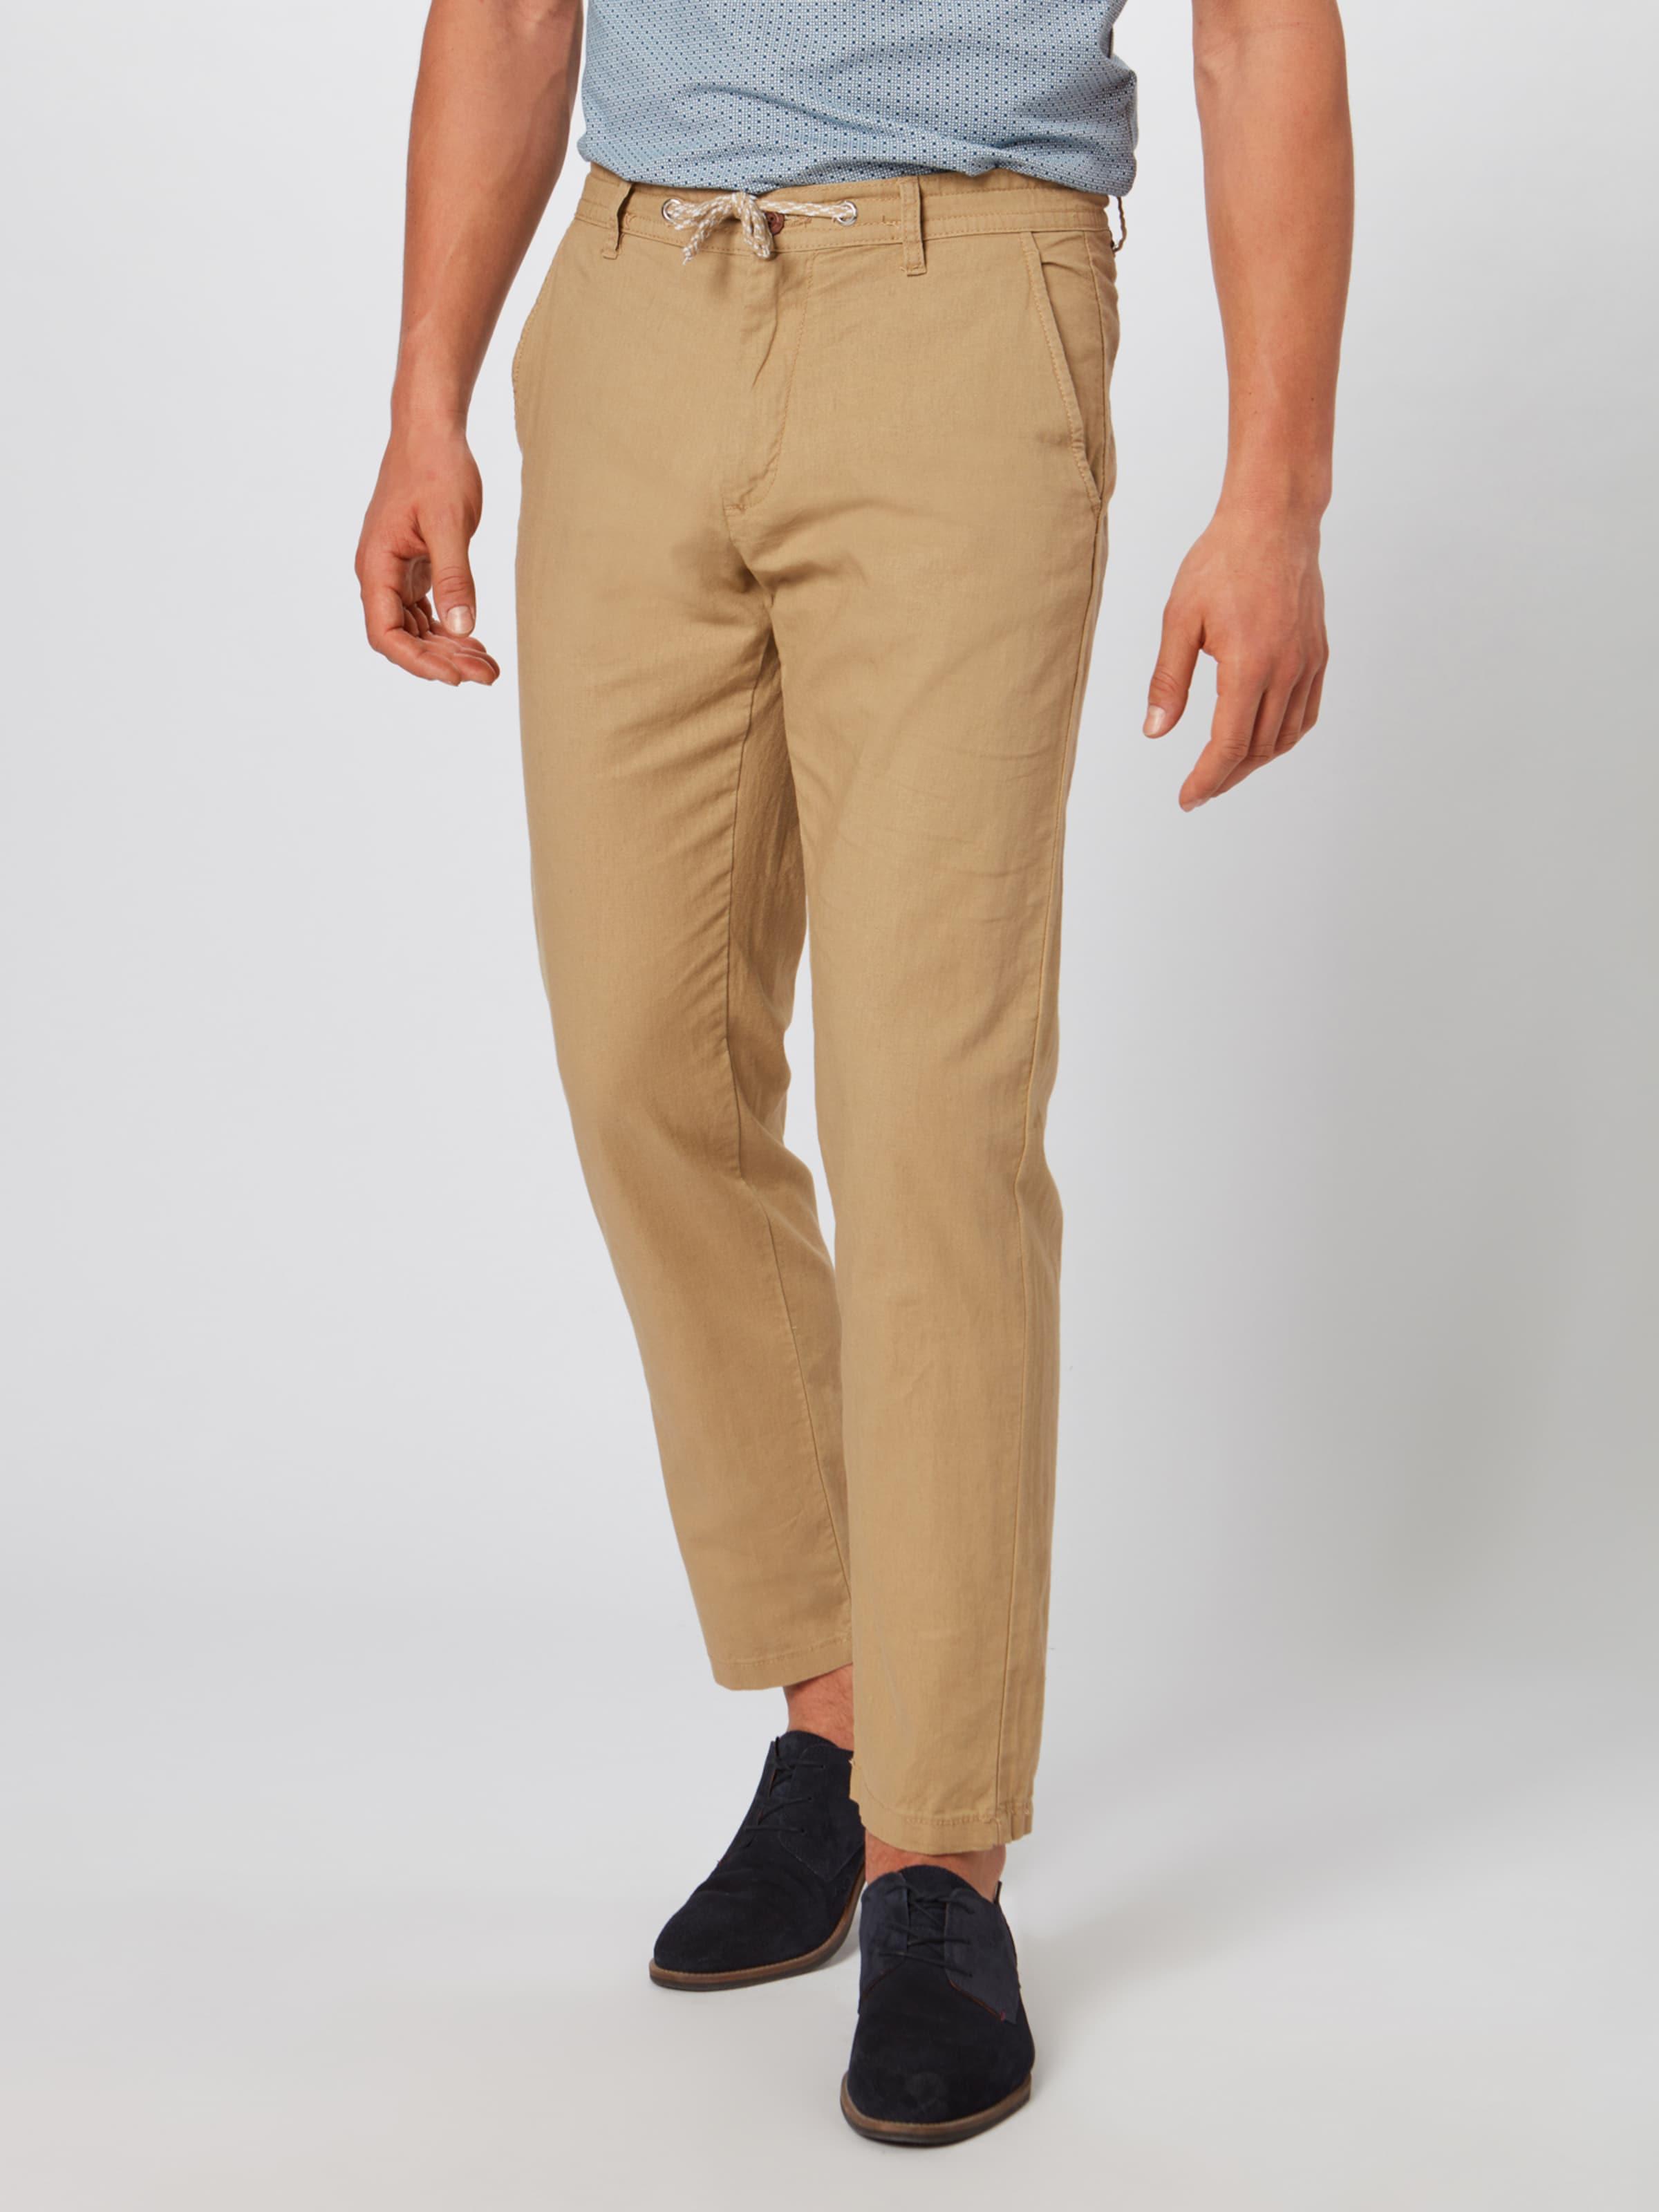 Pantalon En Indicode Jeans 'venedig' Bleu Marine IYfvgb67ym